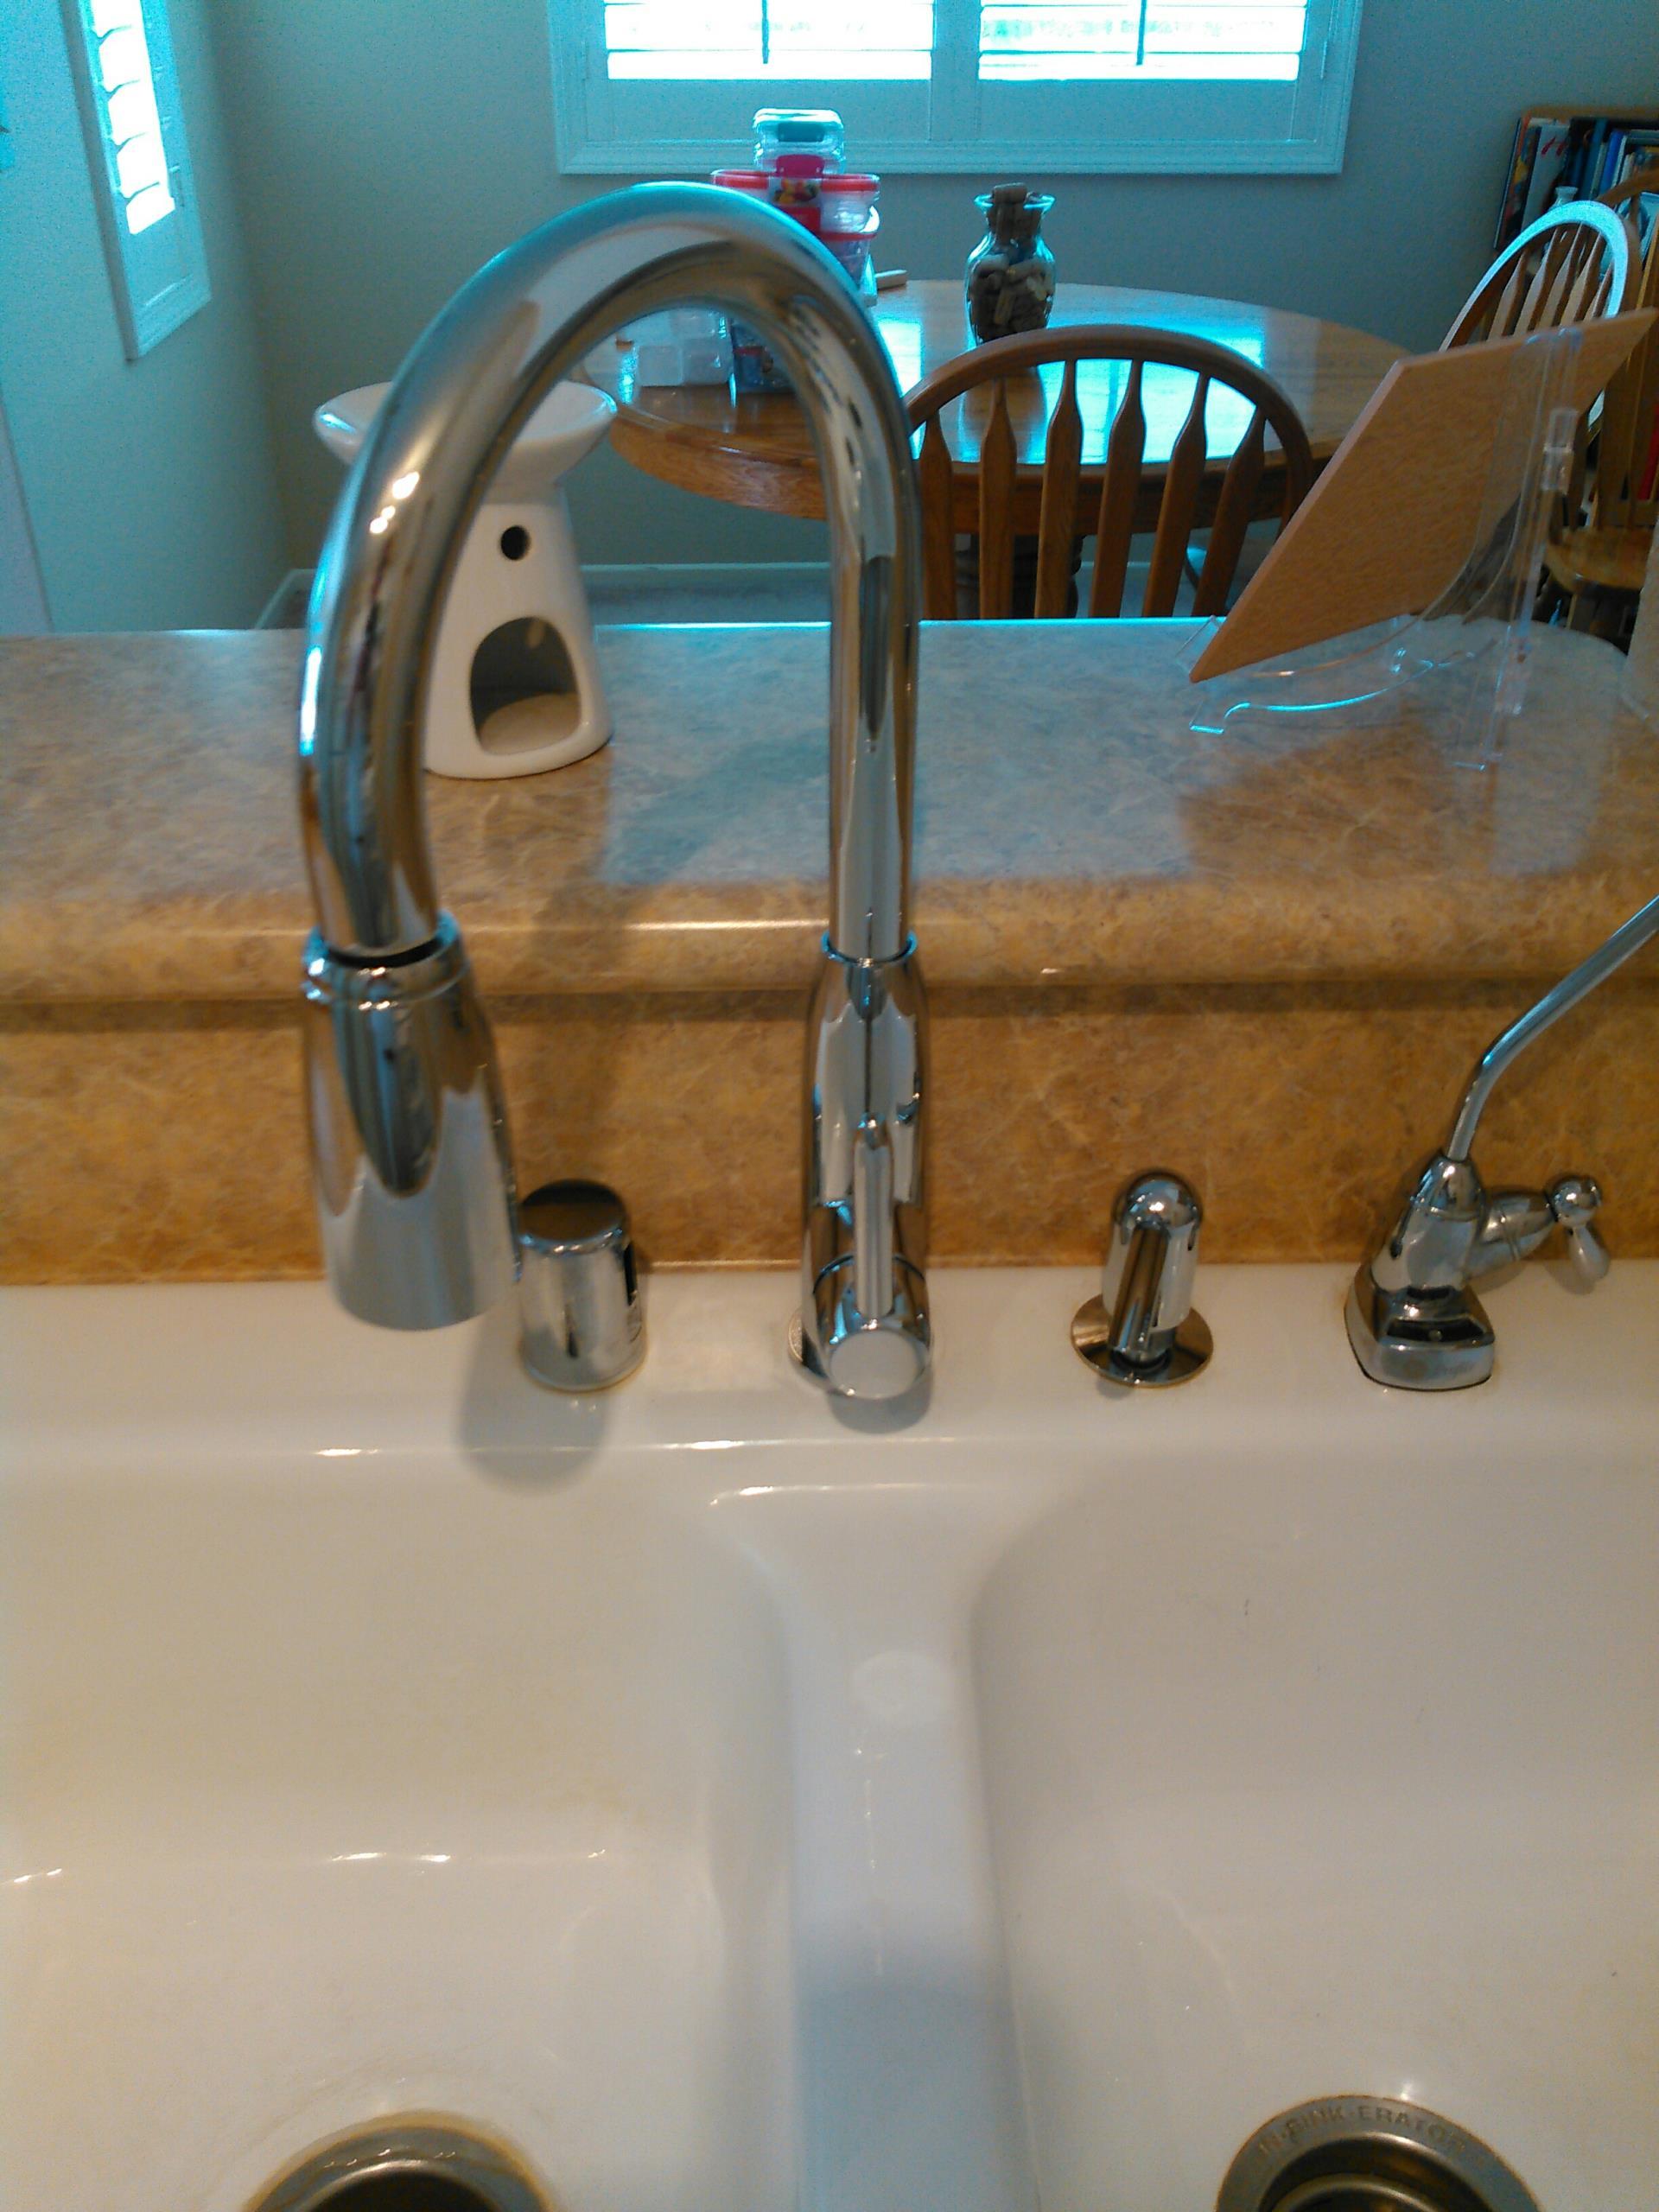 Santa Clarita, CA - Install new kitchen faucet and shower repair.